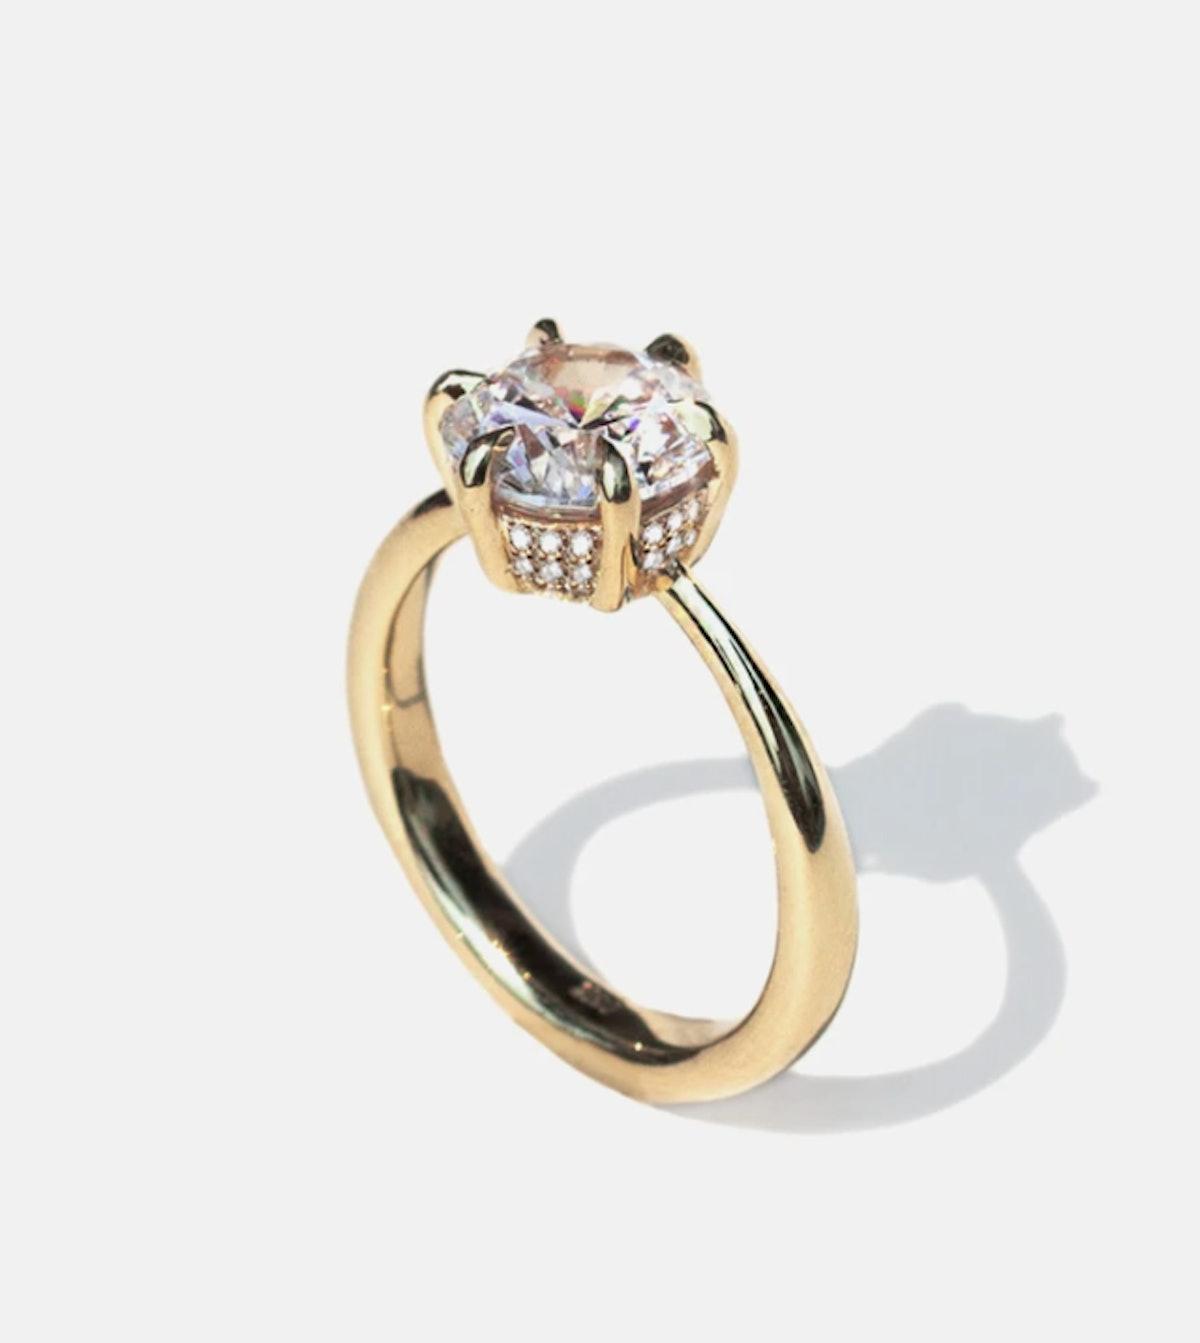 KATKIM's Diamond Arena Engagement Ring with a 360 hidden halo.